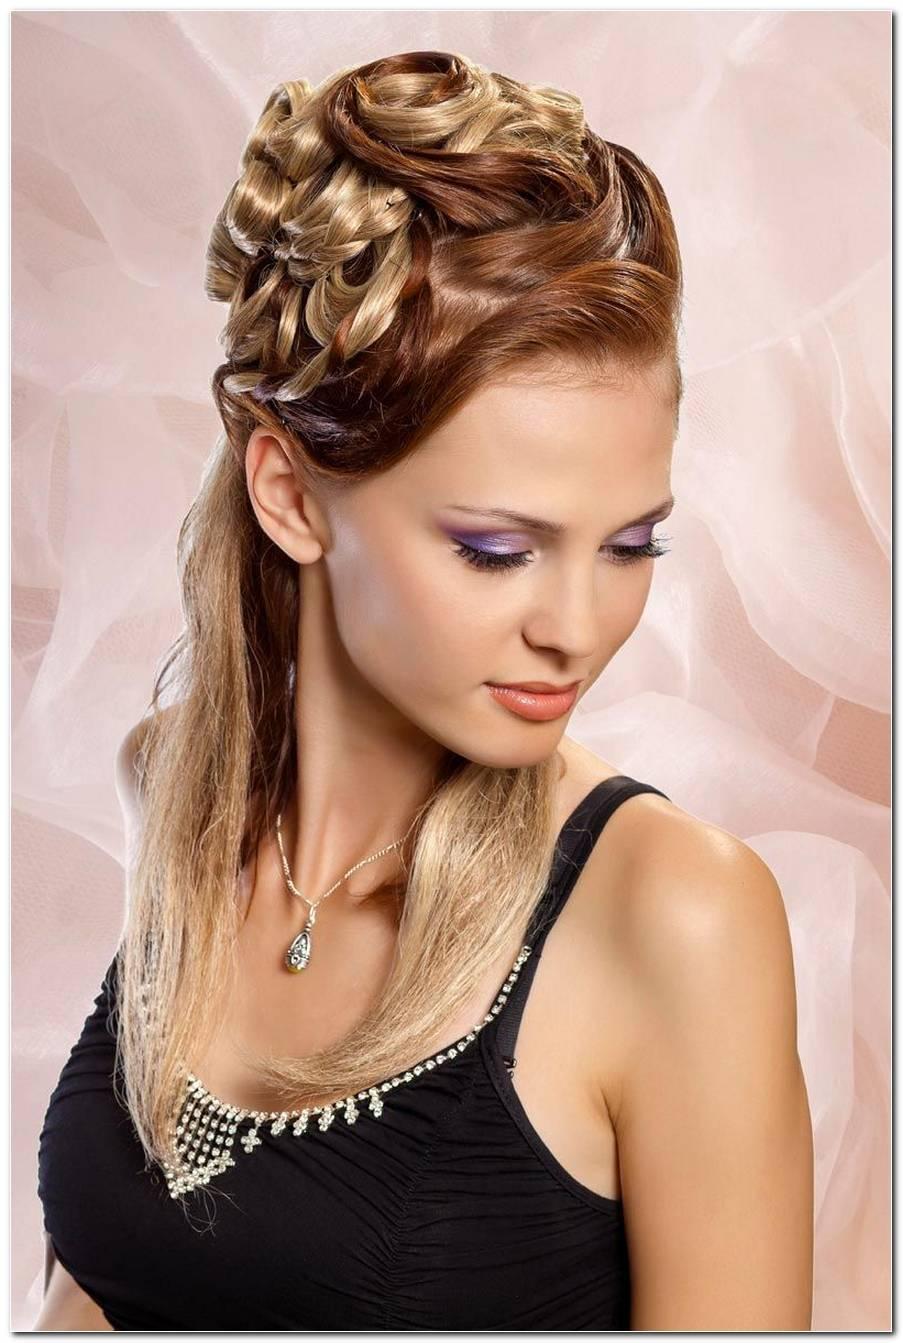 Steck Frisur Lange Haare